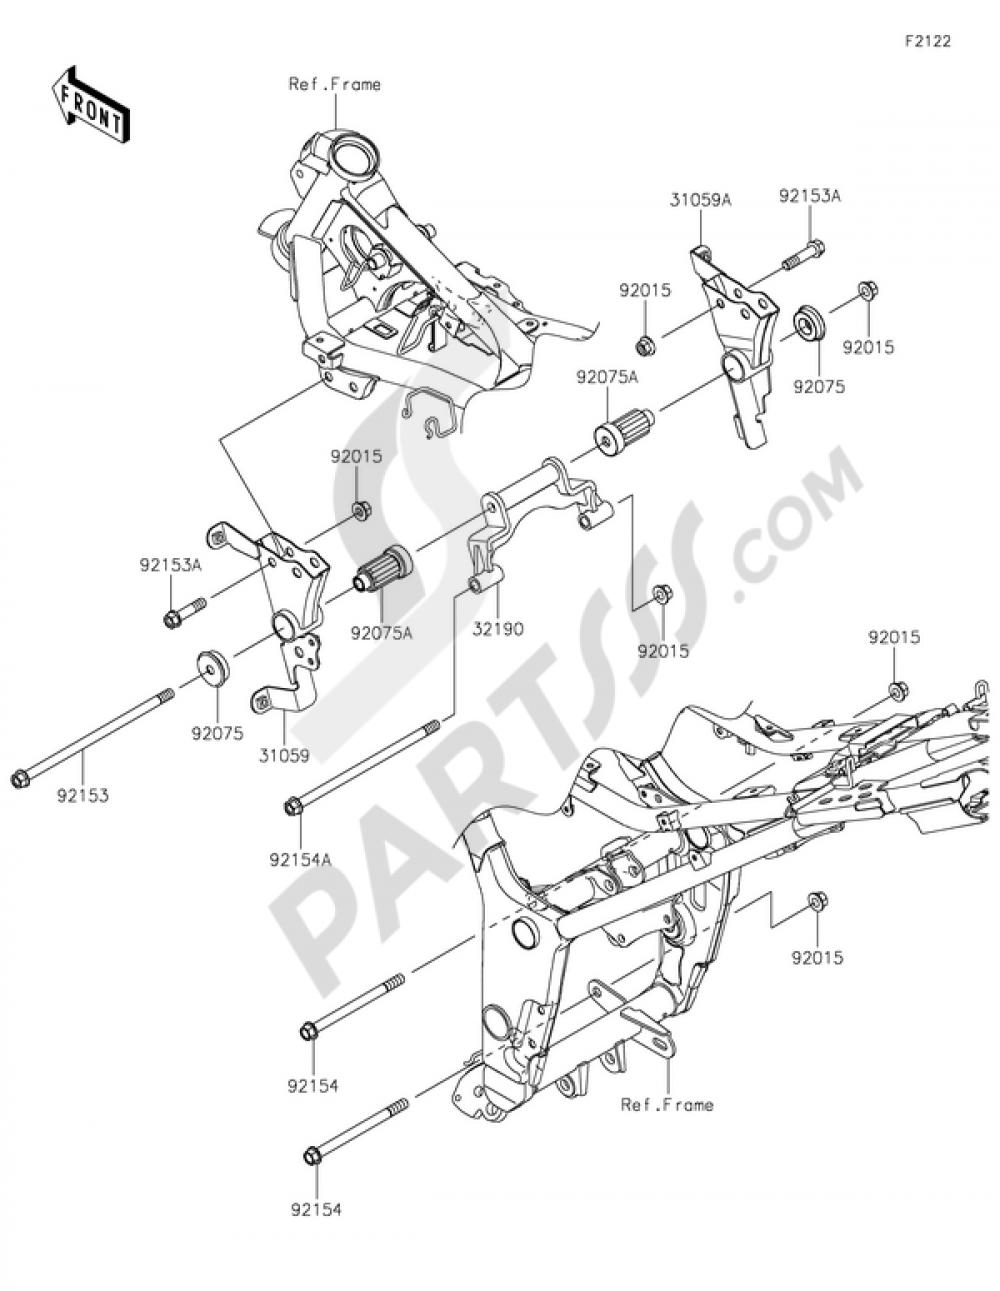 Engine Mount Kawasaki NINJA 300 ABS 2014 | 2014 Ninja 300 Engine Diagram |  | Partsss